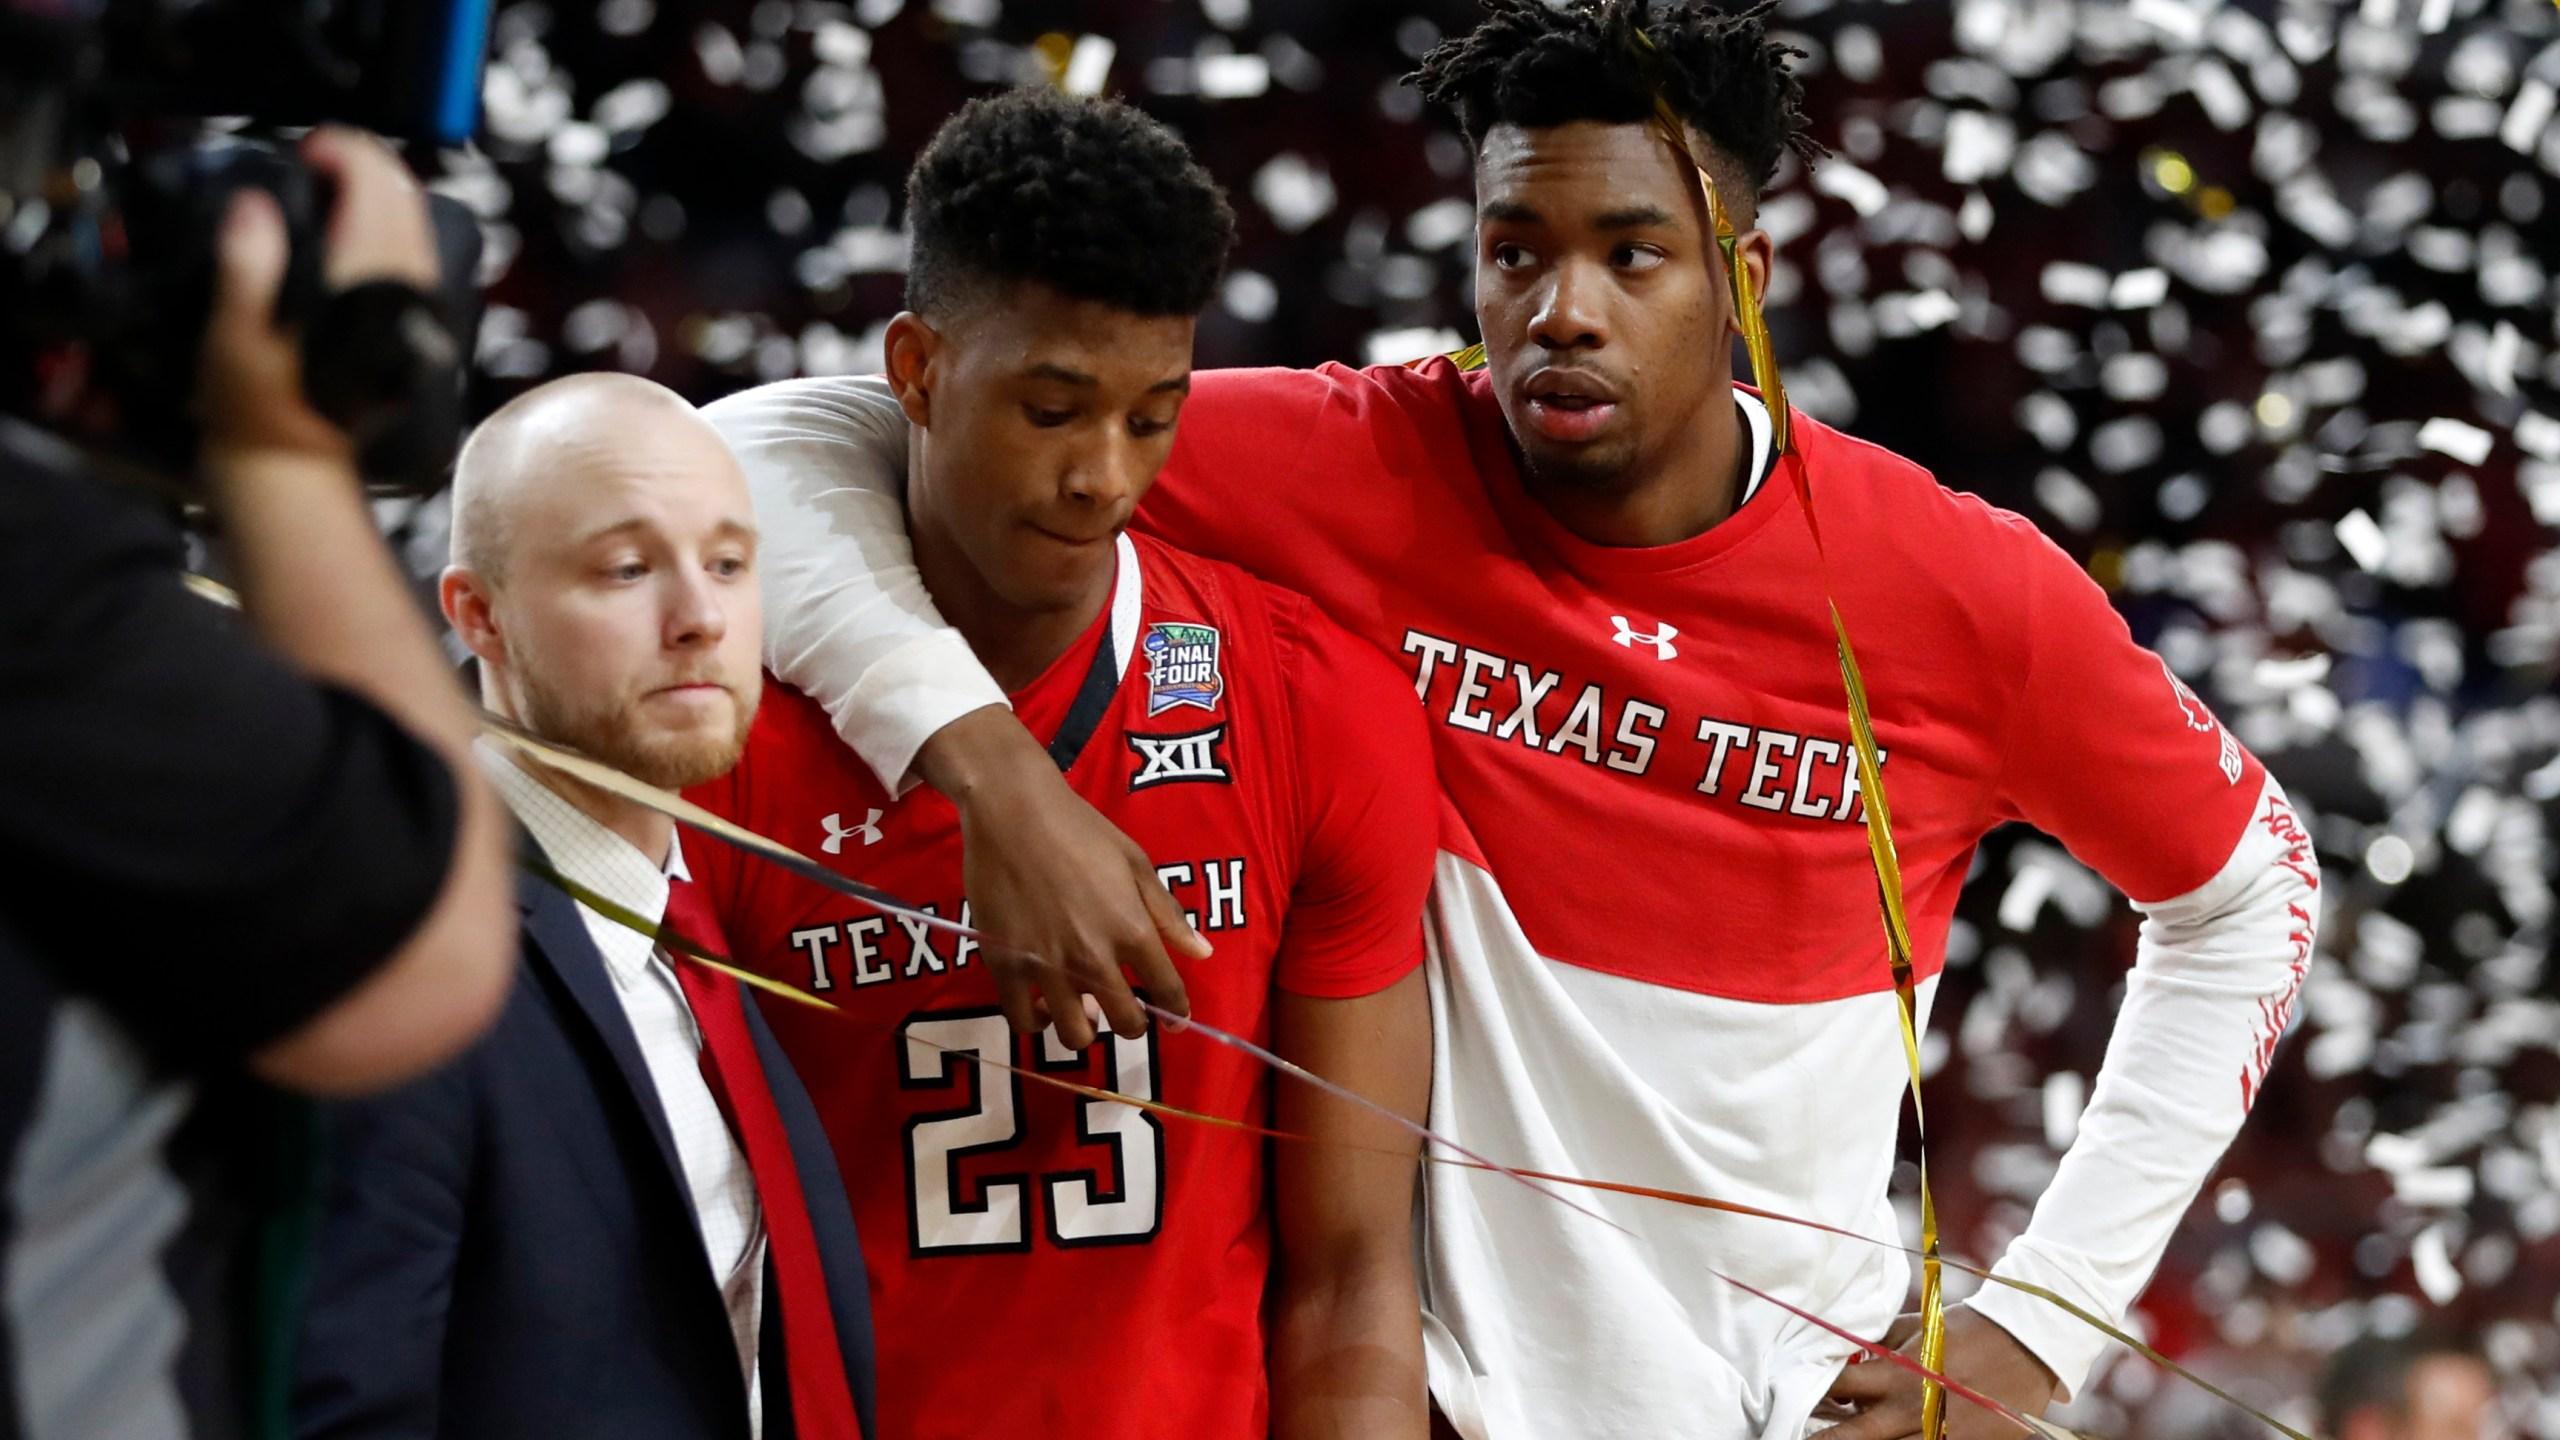 Final_Four_Texas_Tech_Virginia_Basketball_80769-159532.jpg48508897